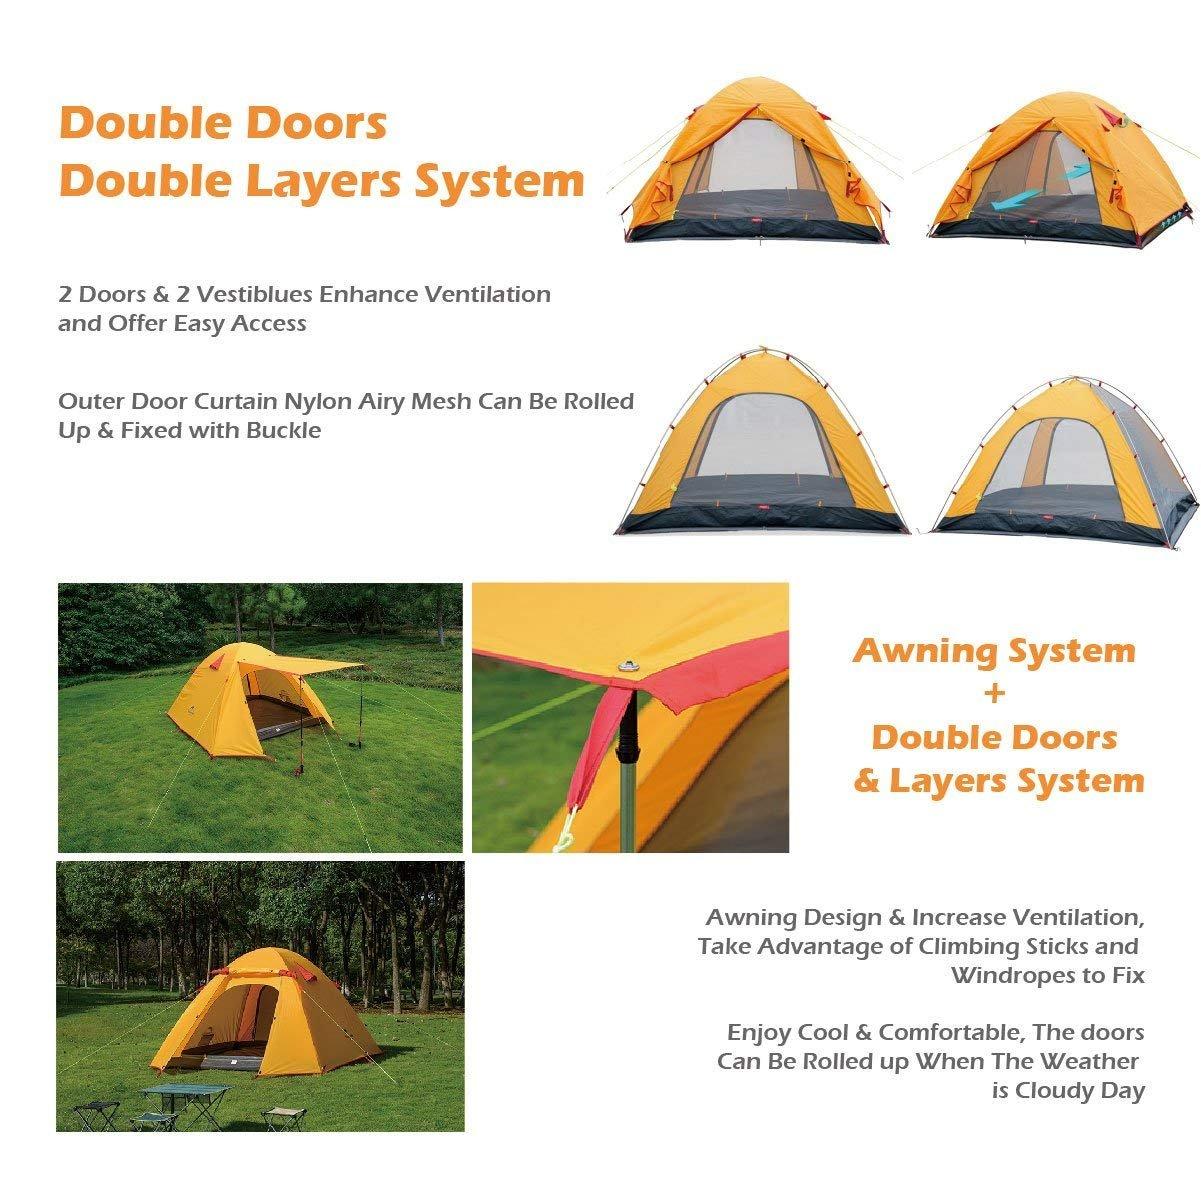 3 Saison Wasserdicht Zelt Double Layer f/ür Outdoor Camping Wandern Azarxis 1-4 Personen Ultraleicht Zelt